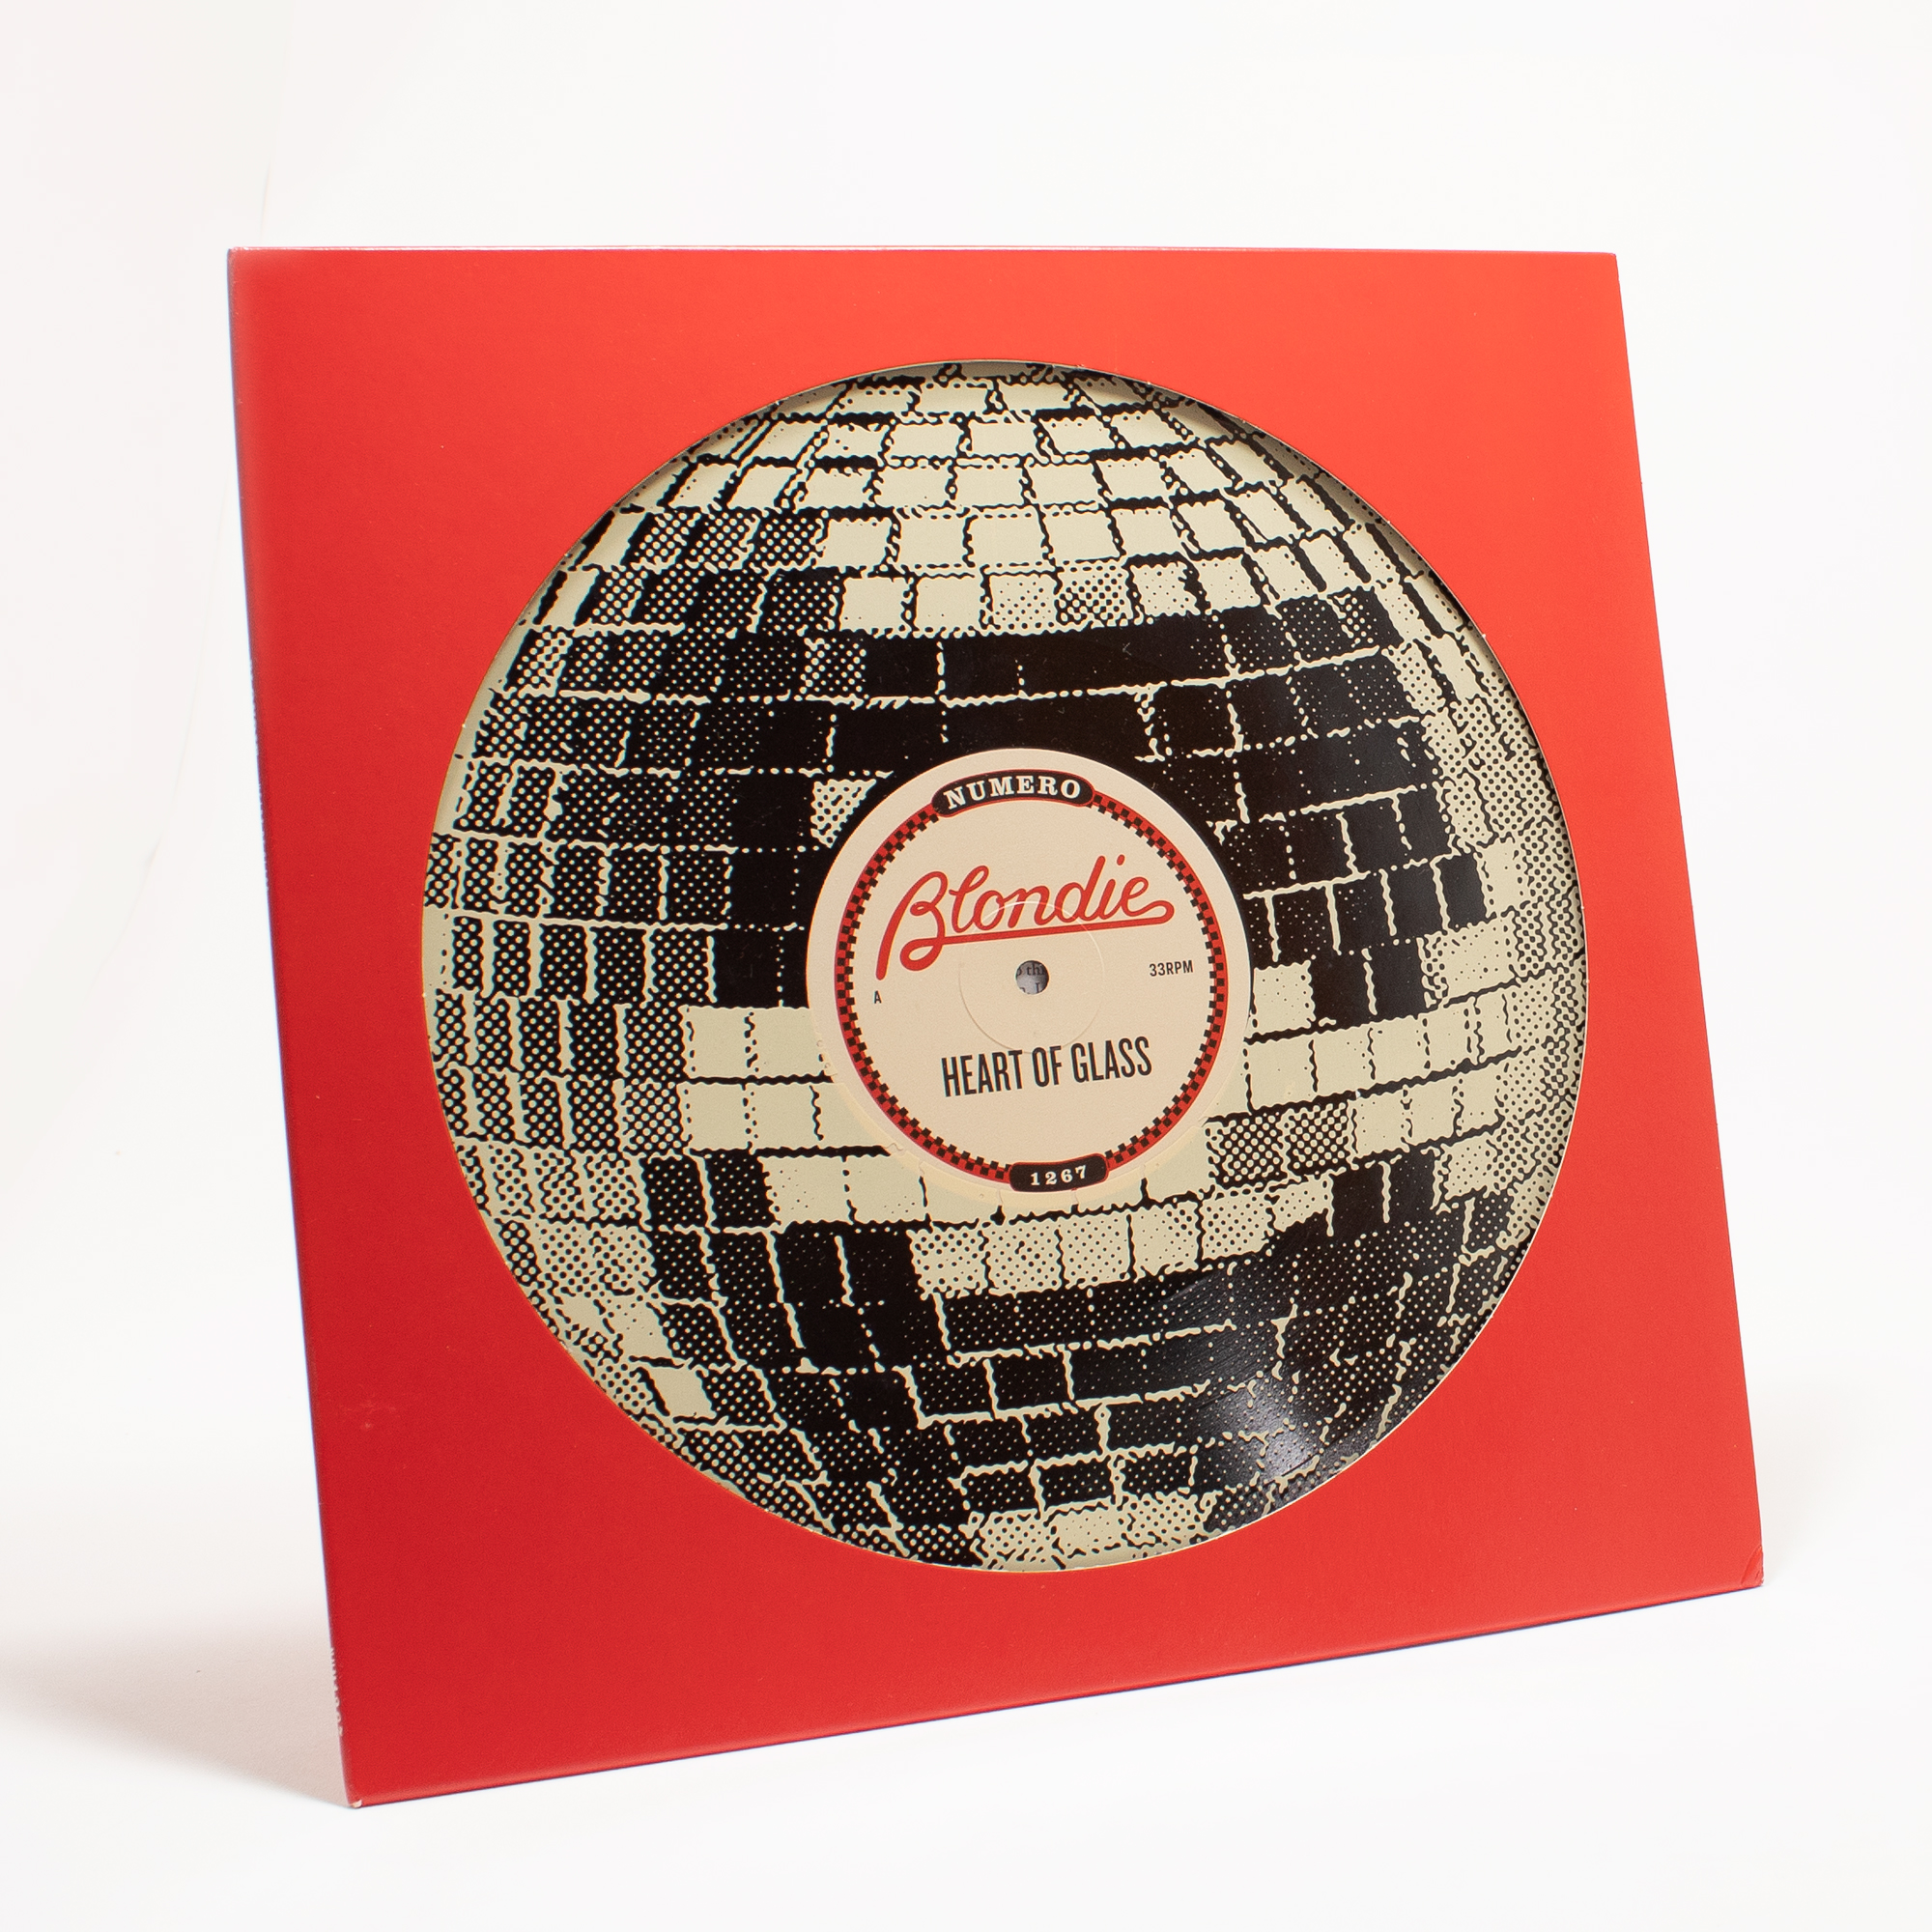 "HEART OF GLASS - 12"" Vinyl - BlondieUS"